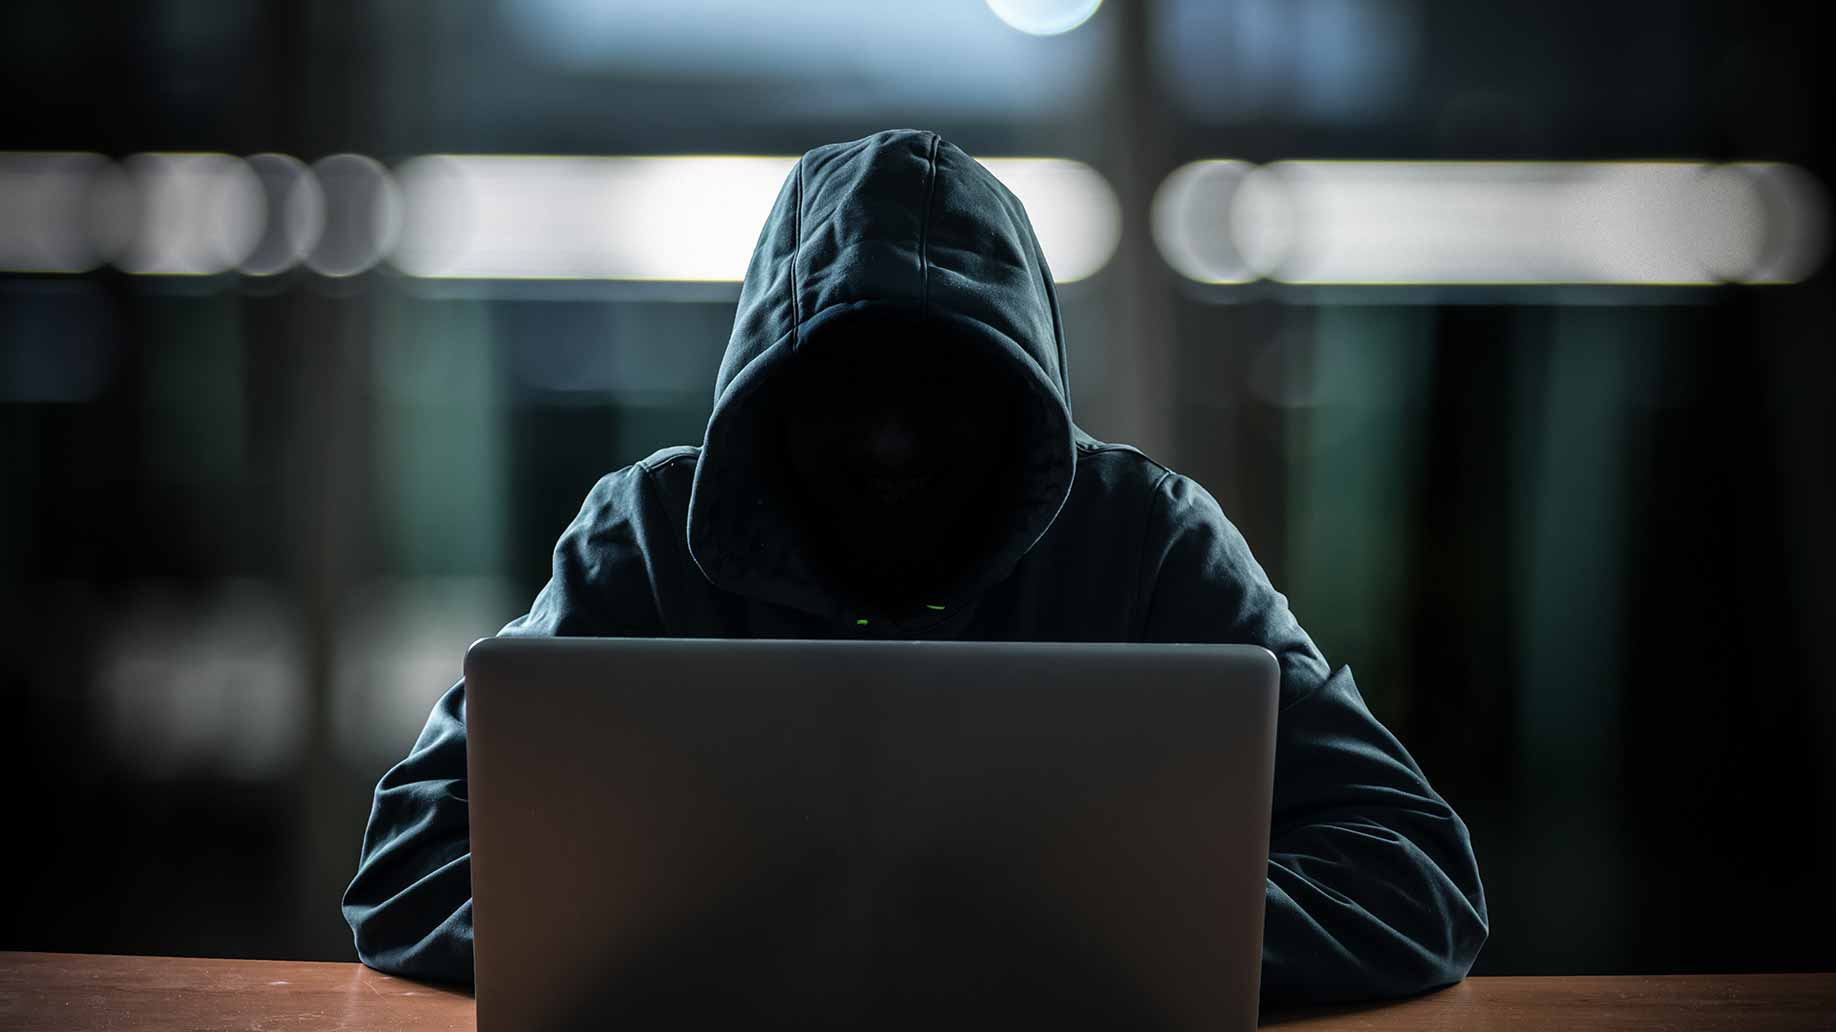 hooded hacker computer spyware